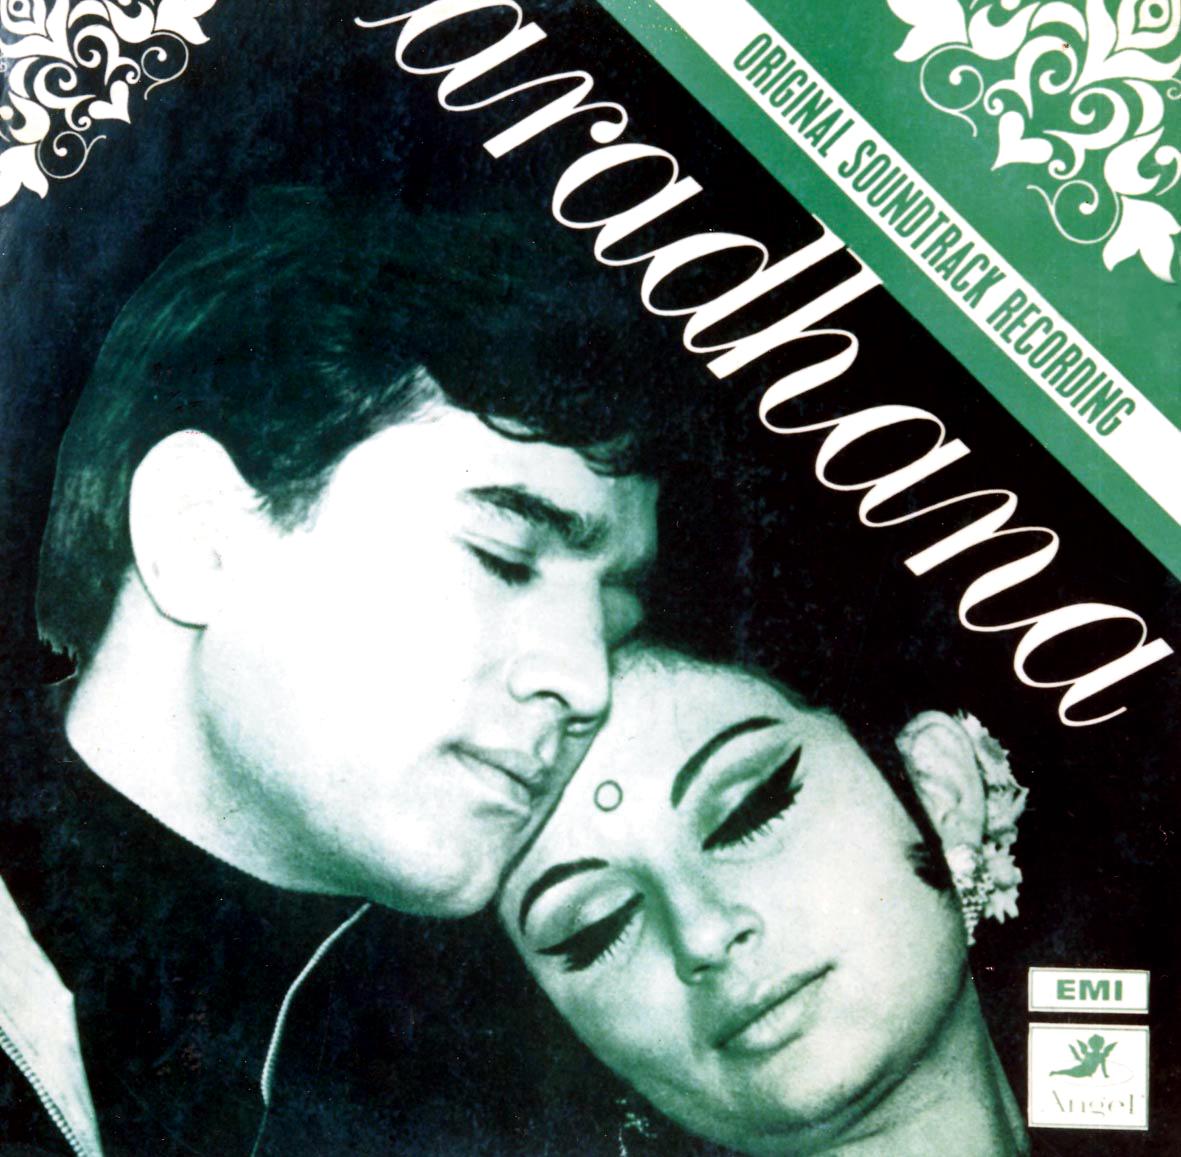 The album cover of Aradhana